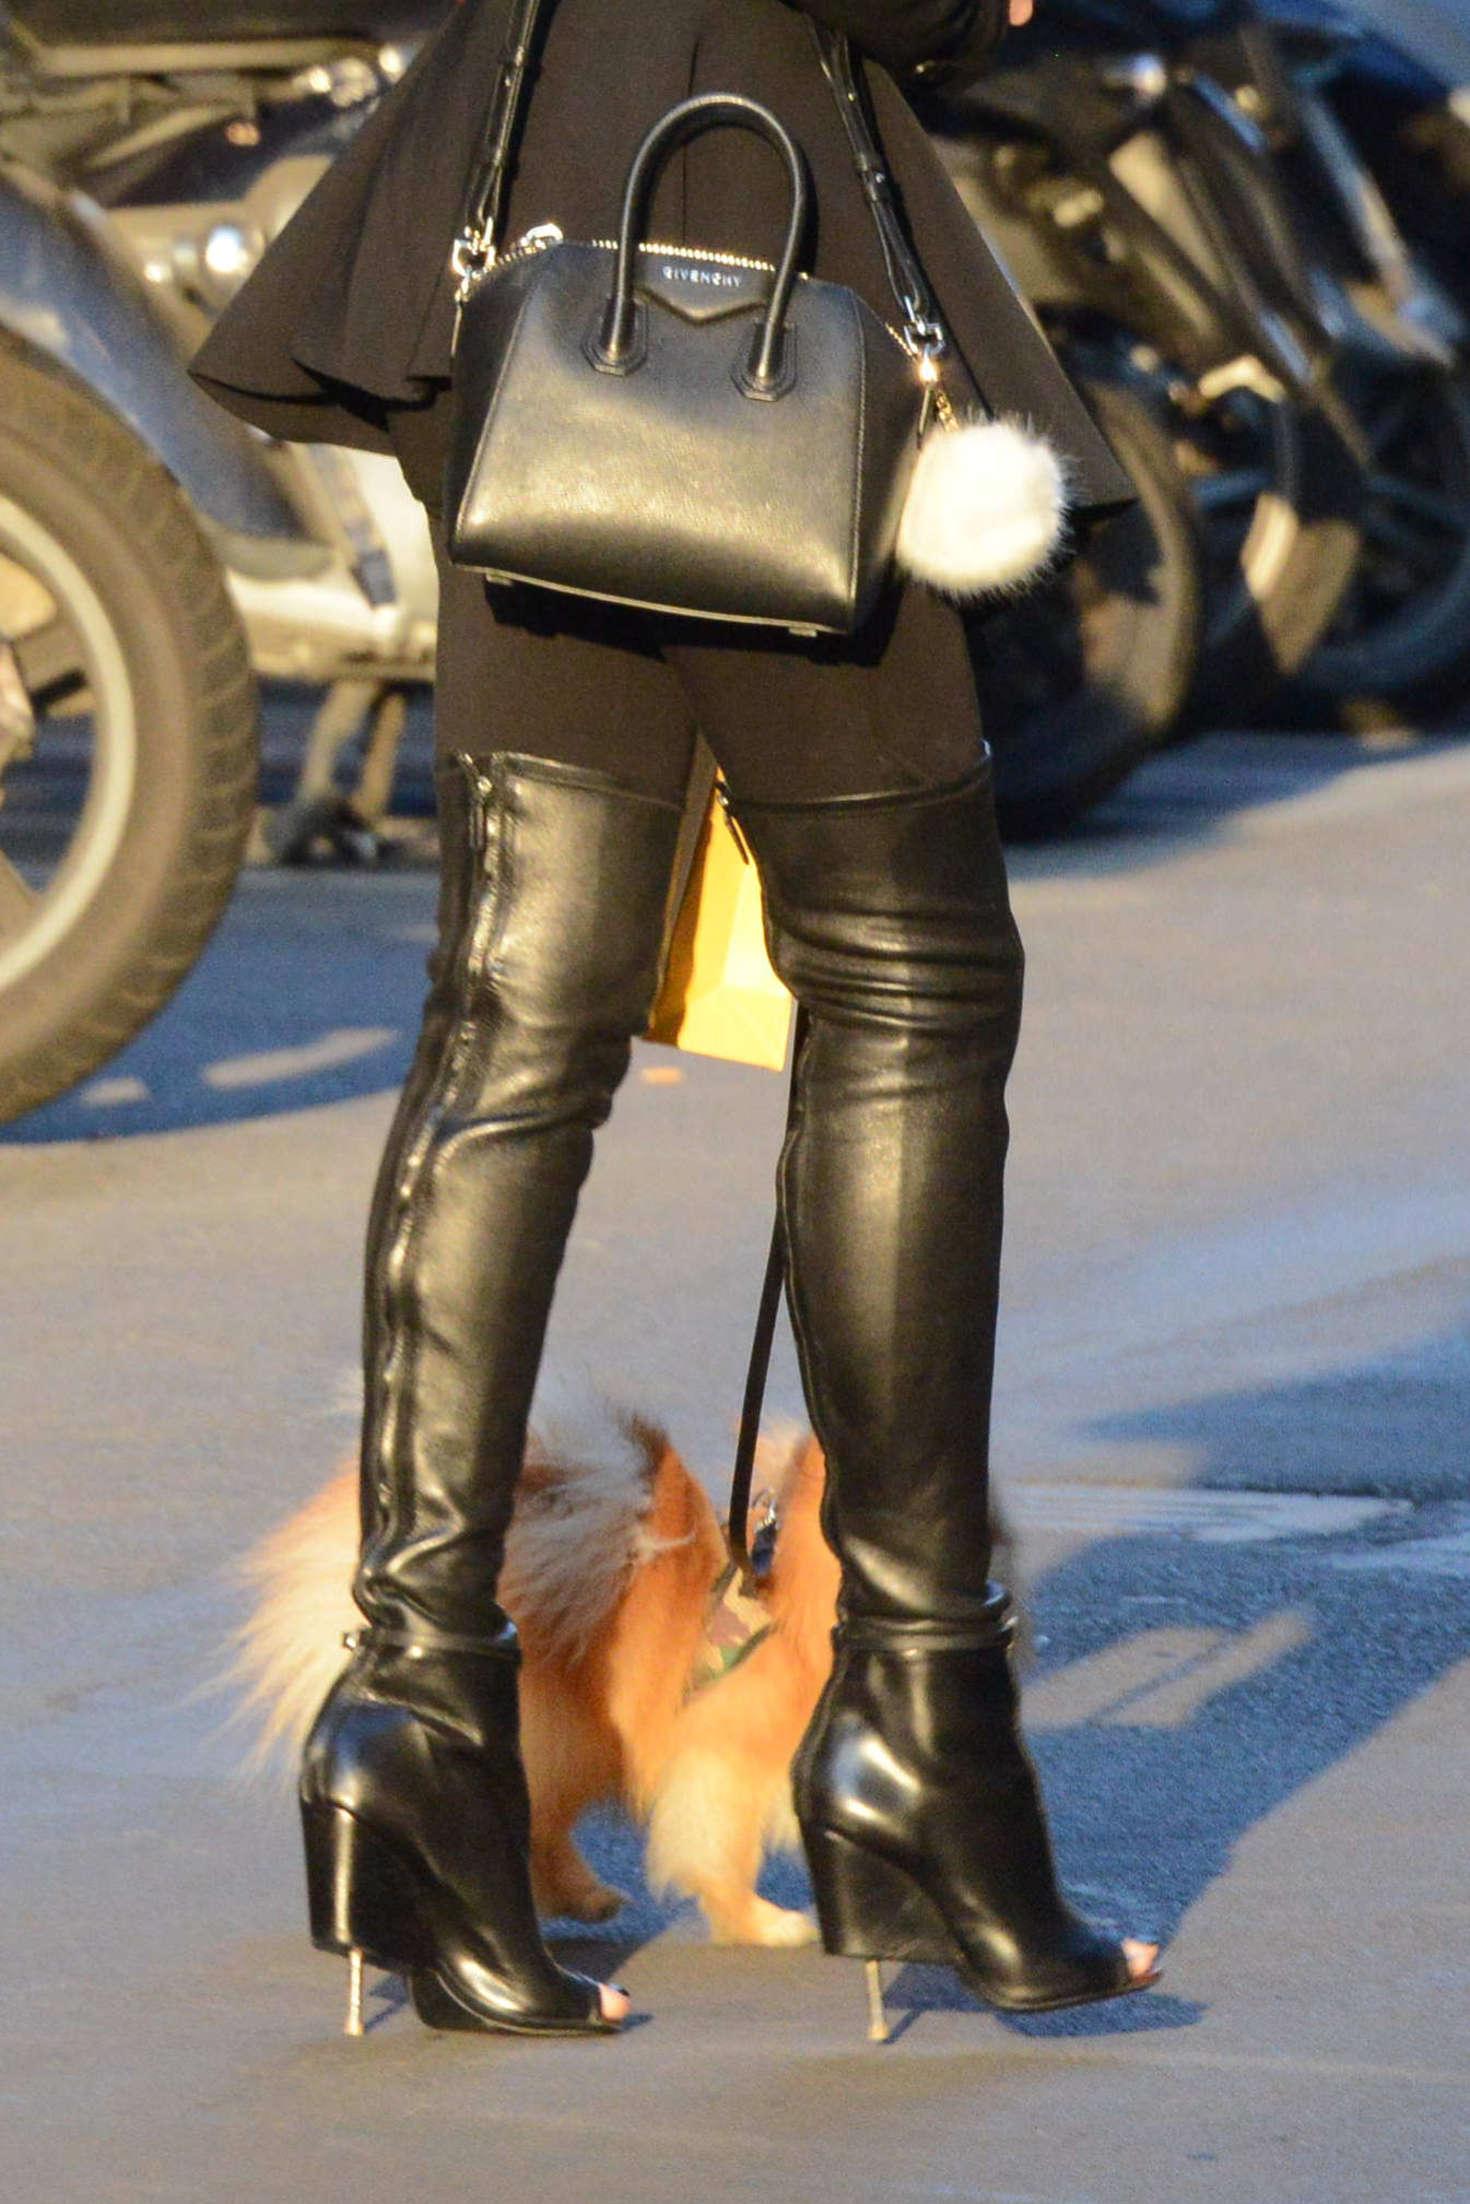 Alessandra Sorcinelli walking her dog